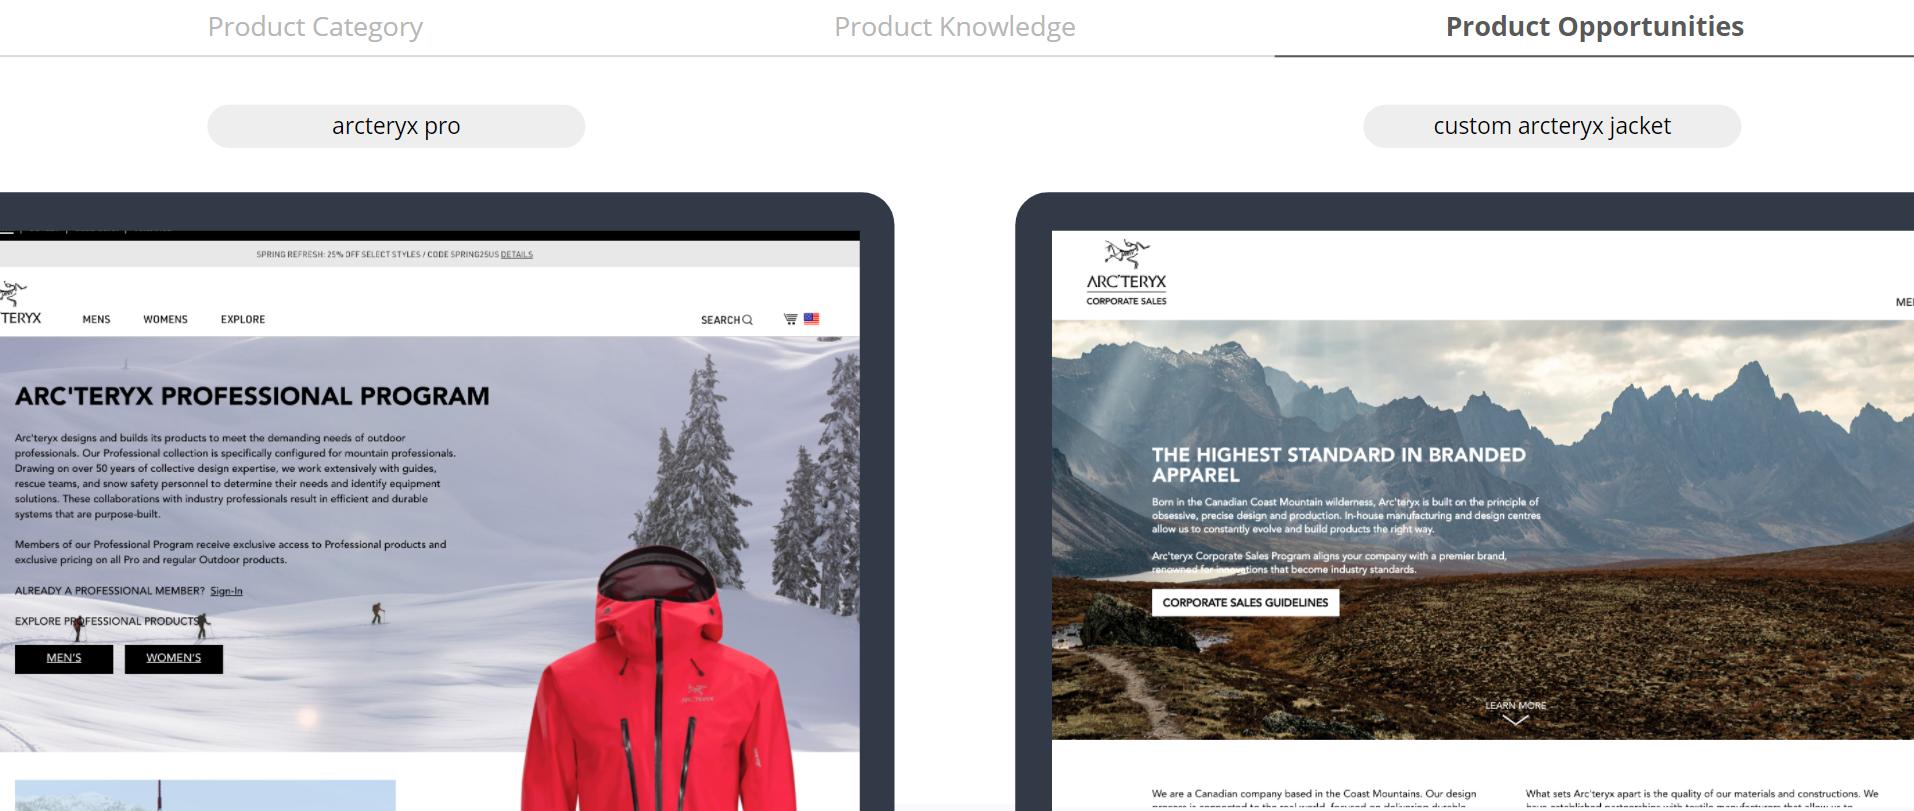 Arcteryx - Product Opportunities